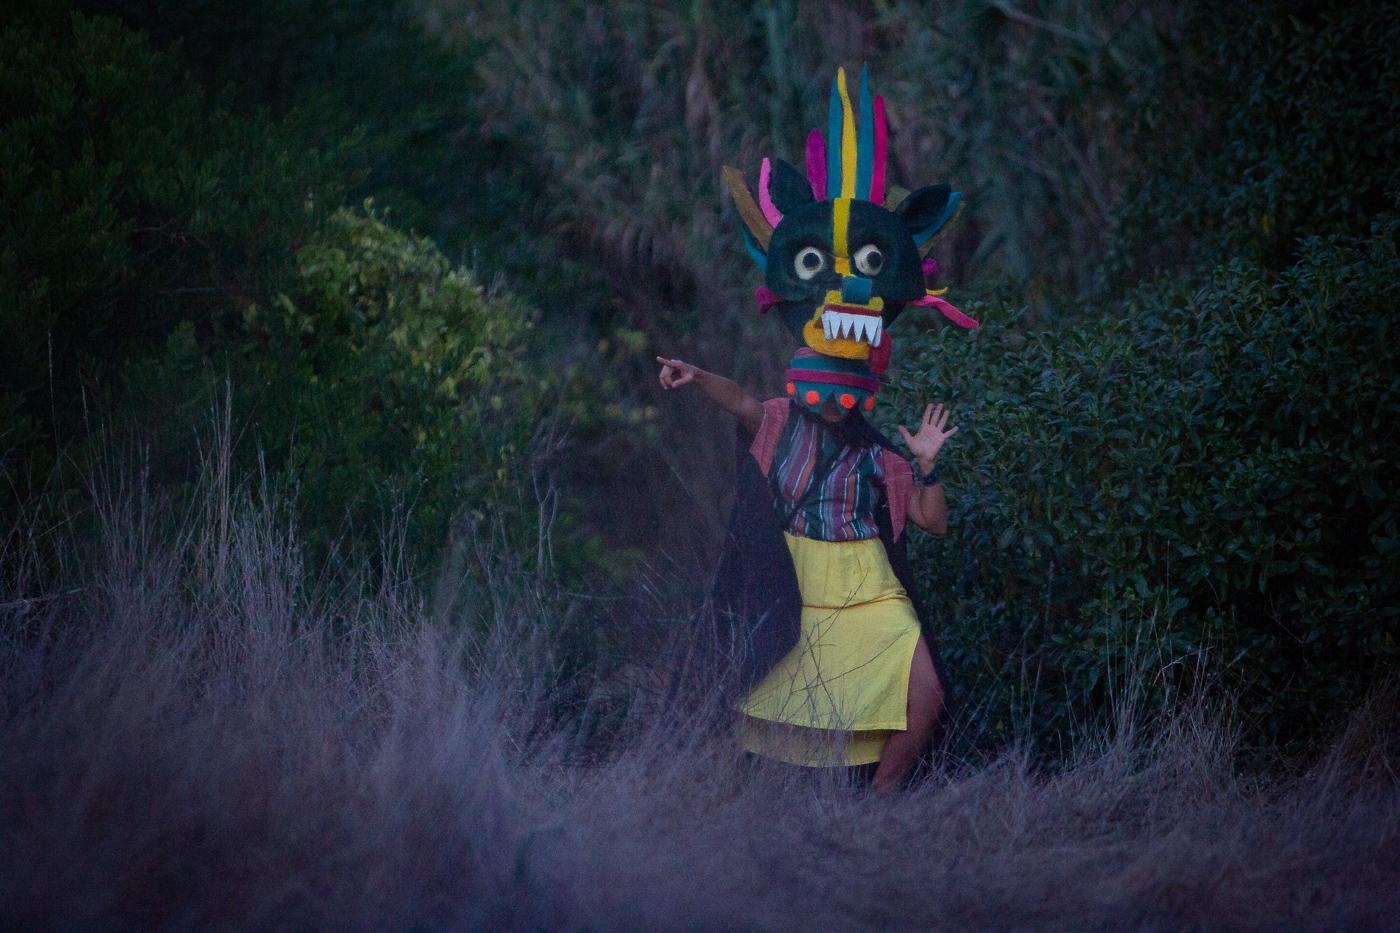 ohtli en MAR 2018 (Sines, Portugal) - Foto de Alípio Padilha3.jpg